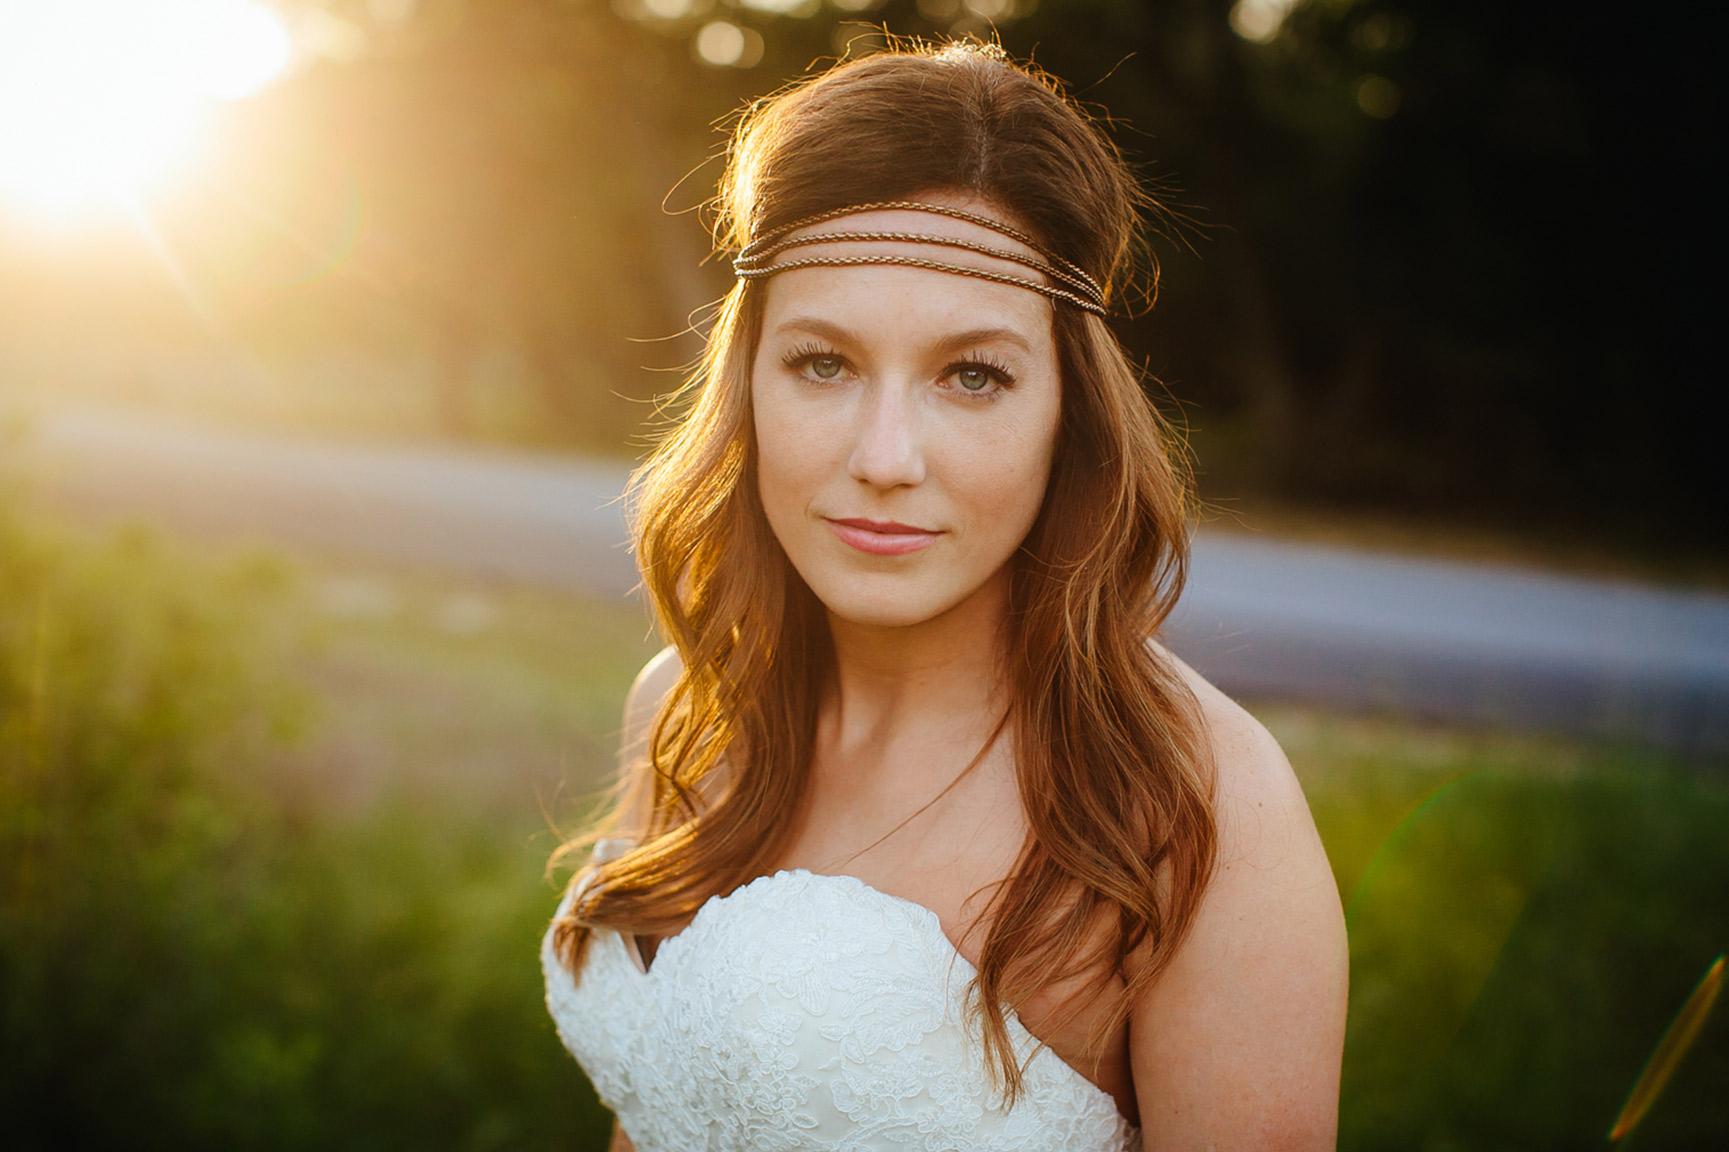 Austin_BRIDAL_WeddingPhotographer008.jpg